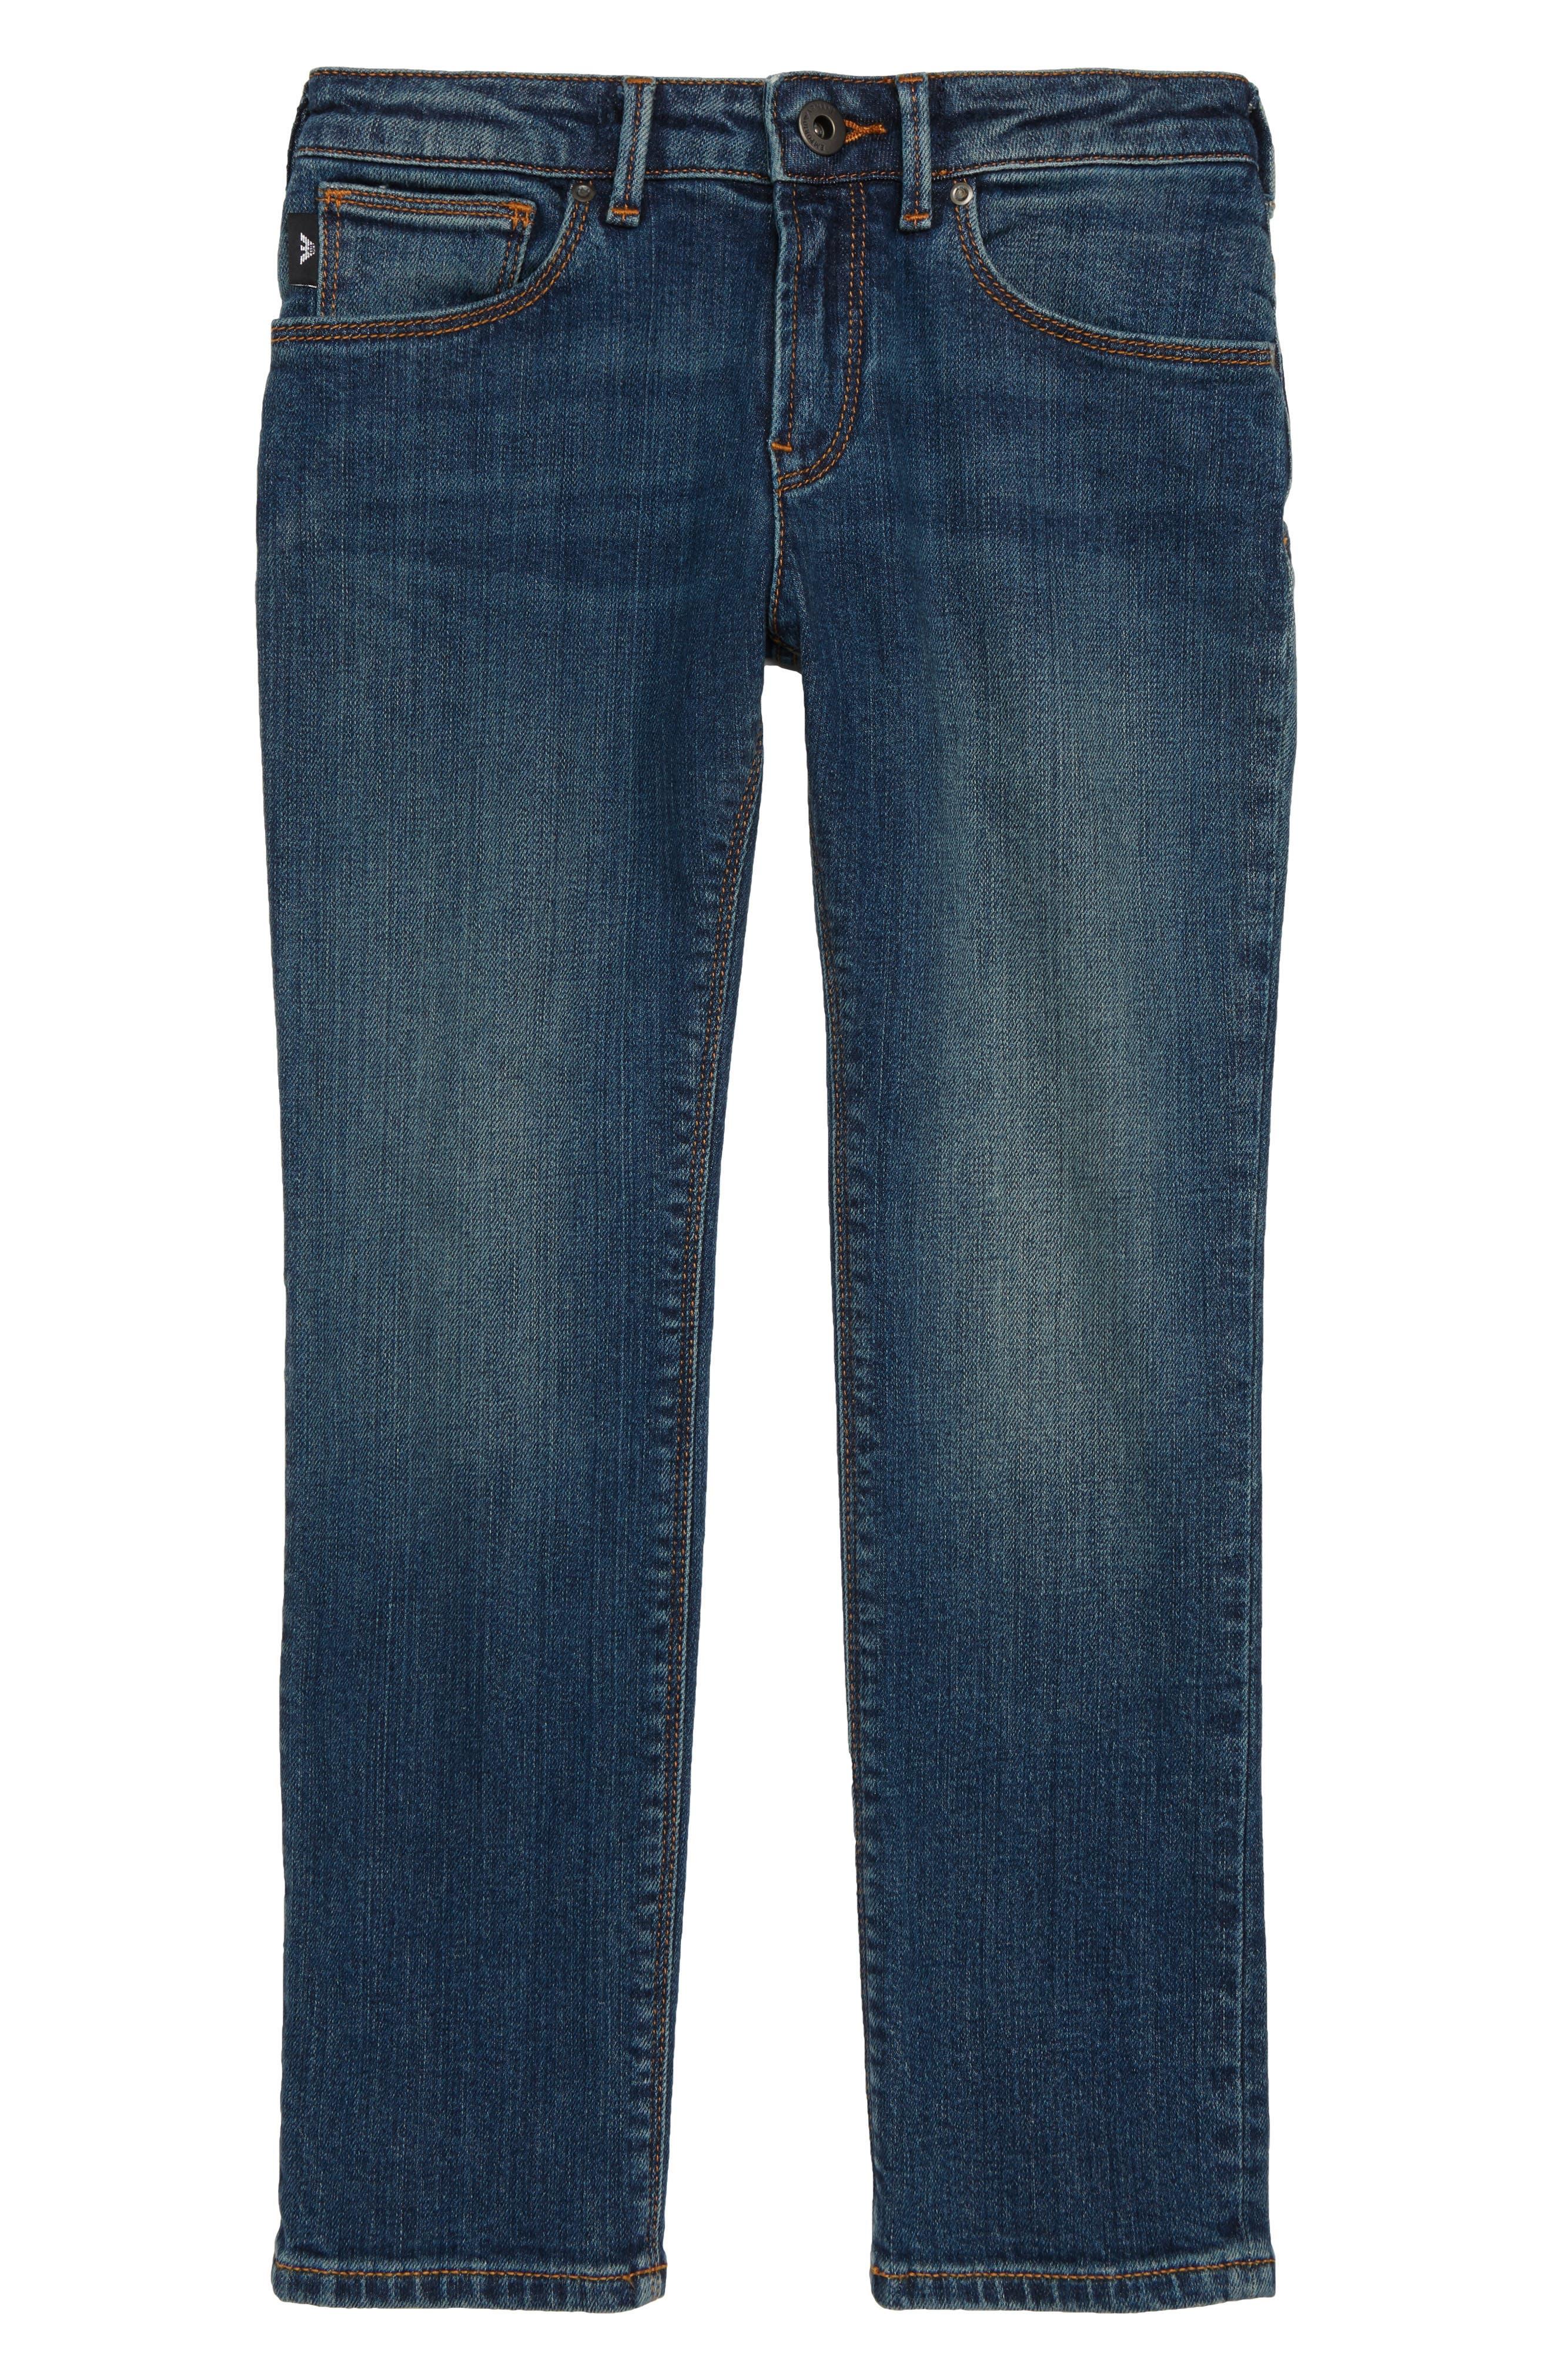 ARMANI JUNIOR Denim Jeans, Main, color, SOLID DARK BLUE